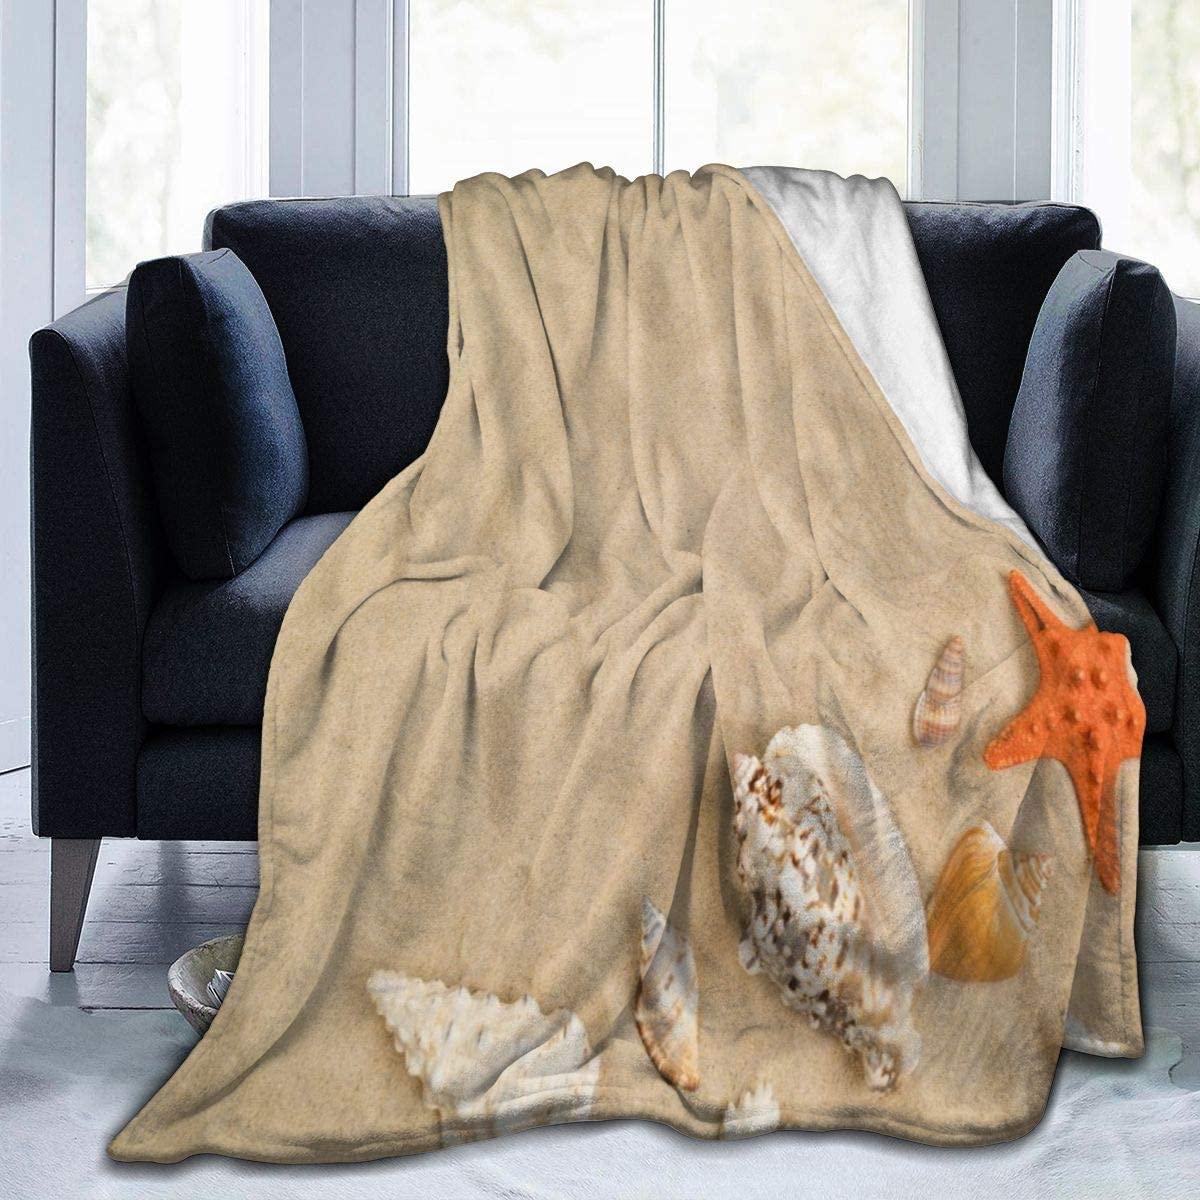 Micro Fleece Plush Soft Baby Blanket Starfish Seashells On Sand Beach Summer Fluffy Warm Toddler Bed/Crib Blanket Lightweight Flannel Daycare Nap Kids Sleeping Tummy Time Throw Blanket Girls Boy Kid/B